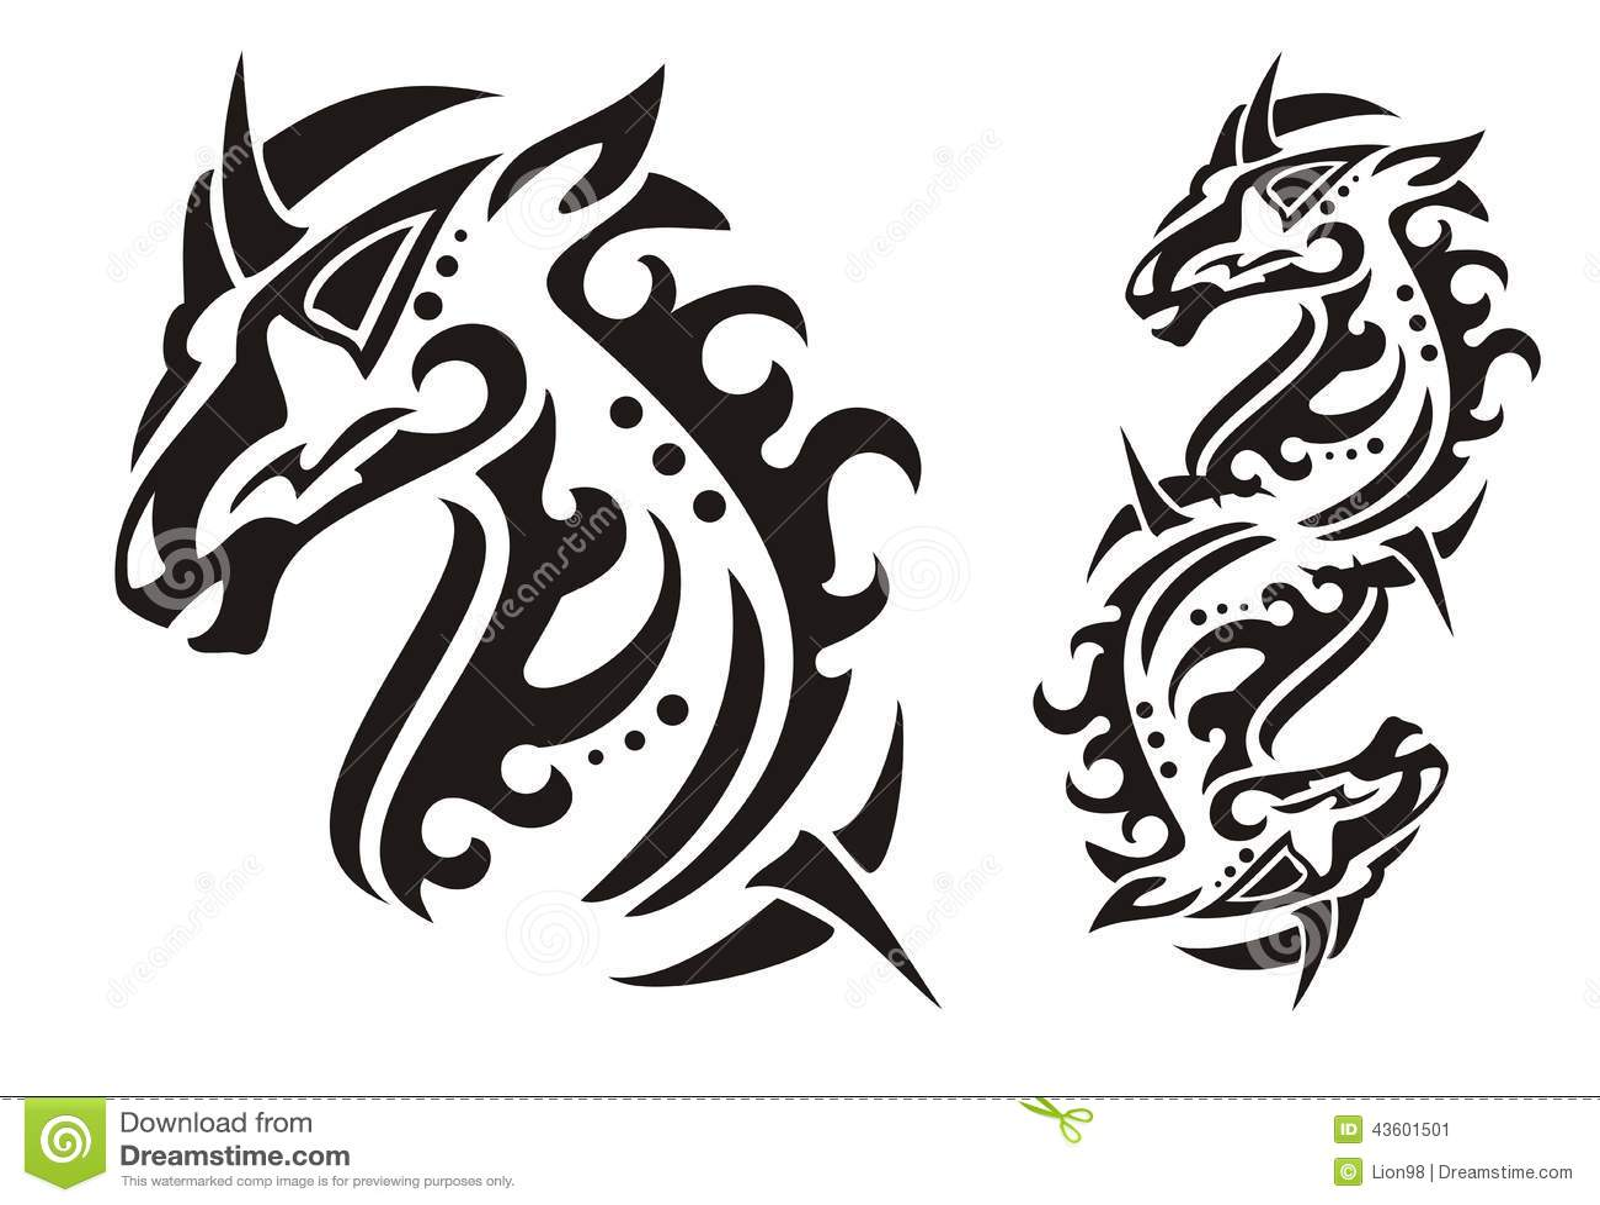 tribal unicorn head stock illustration illustration of magical 43601501. Black Bedroom Furniture Sets. Home Design Ideas